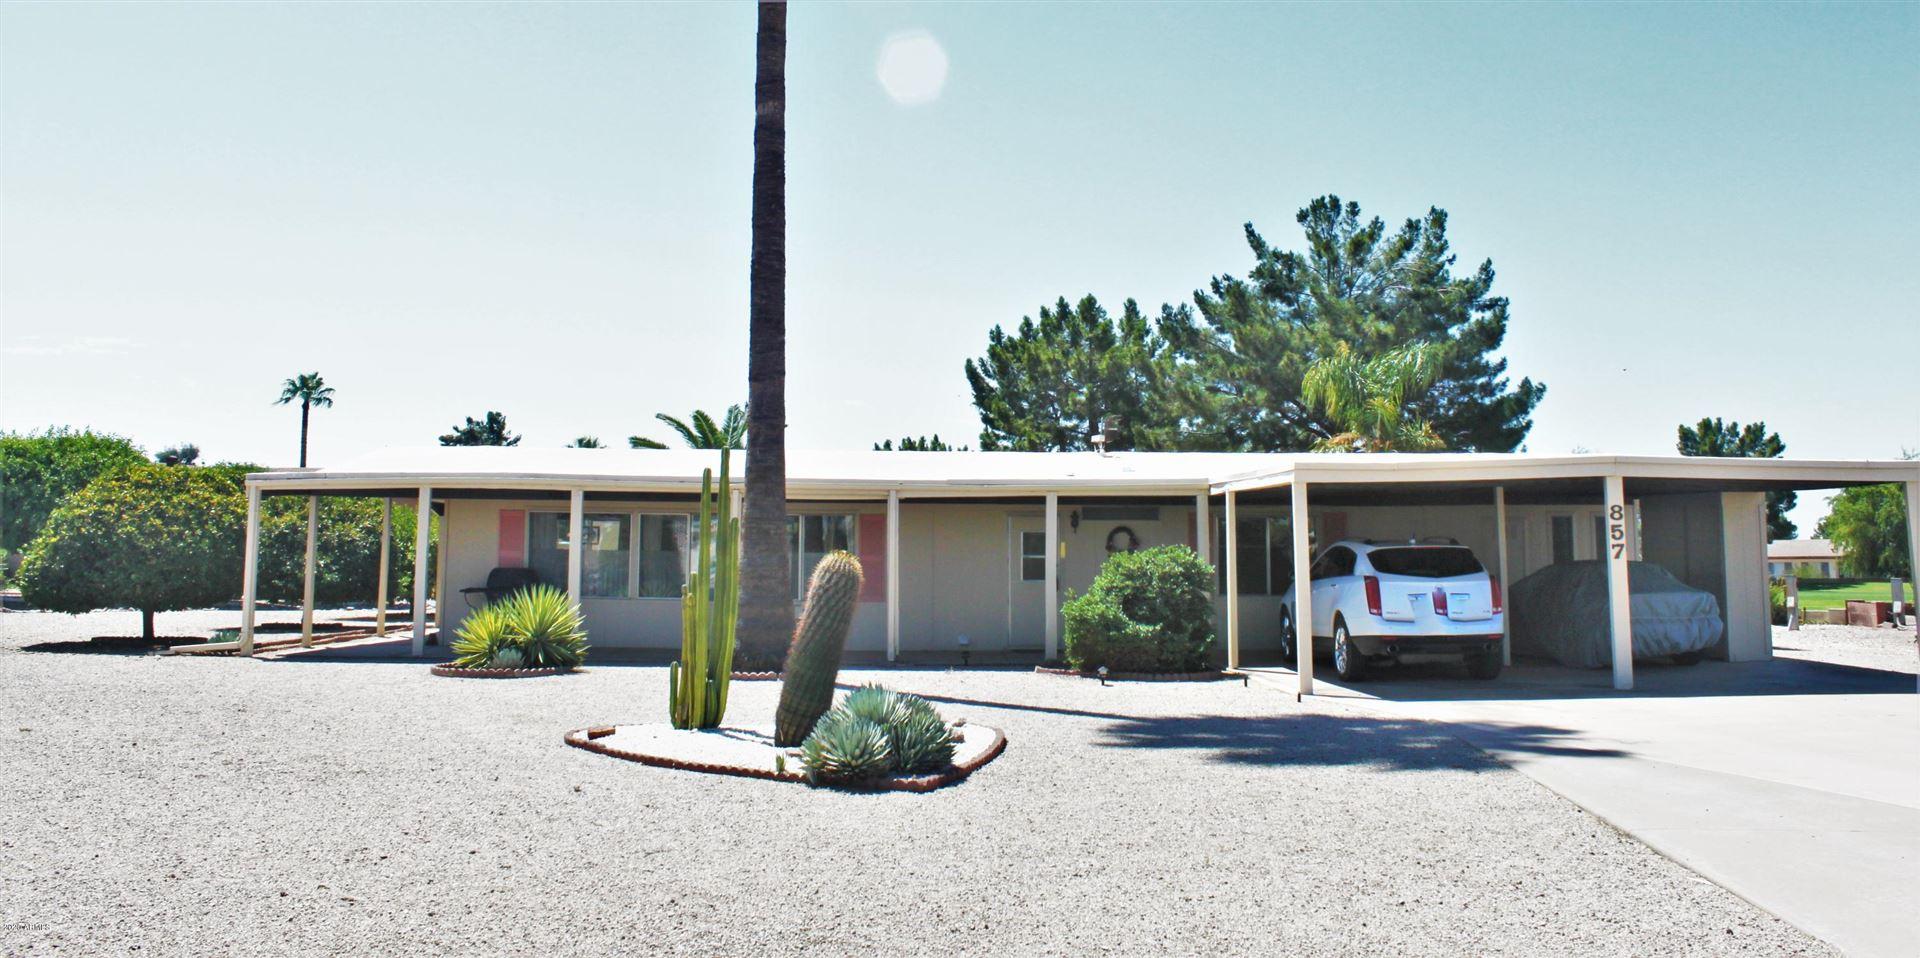 857 S 82ND Place, Mesa, AZ 85208 - MLS#: 6116450